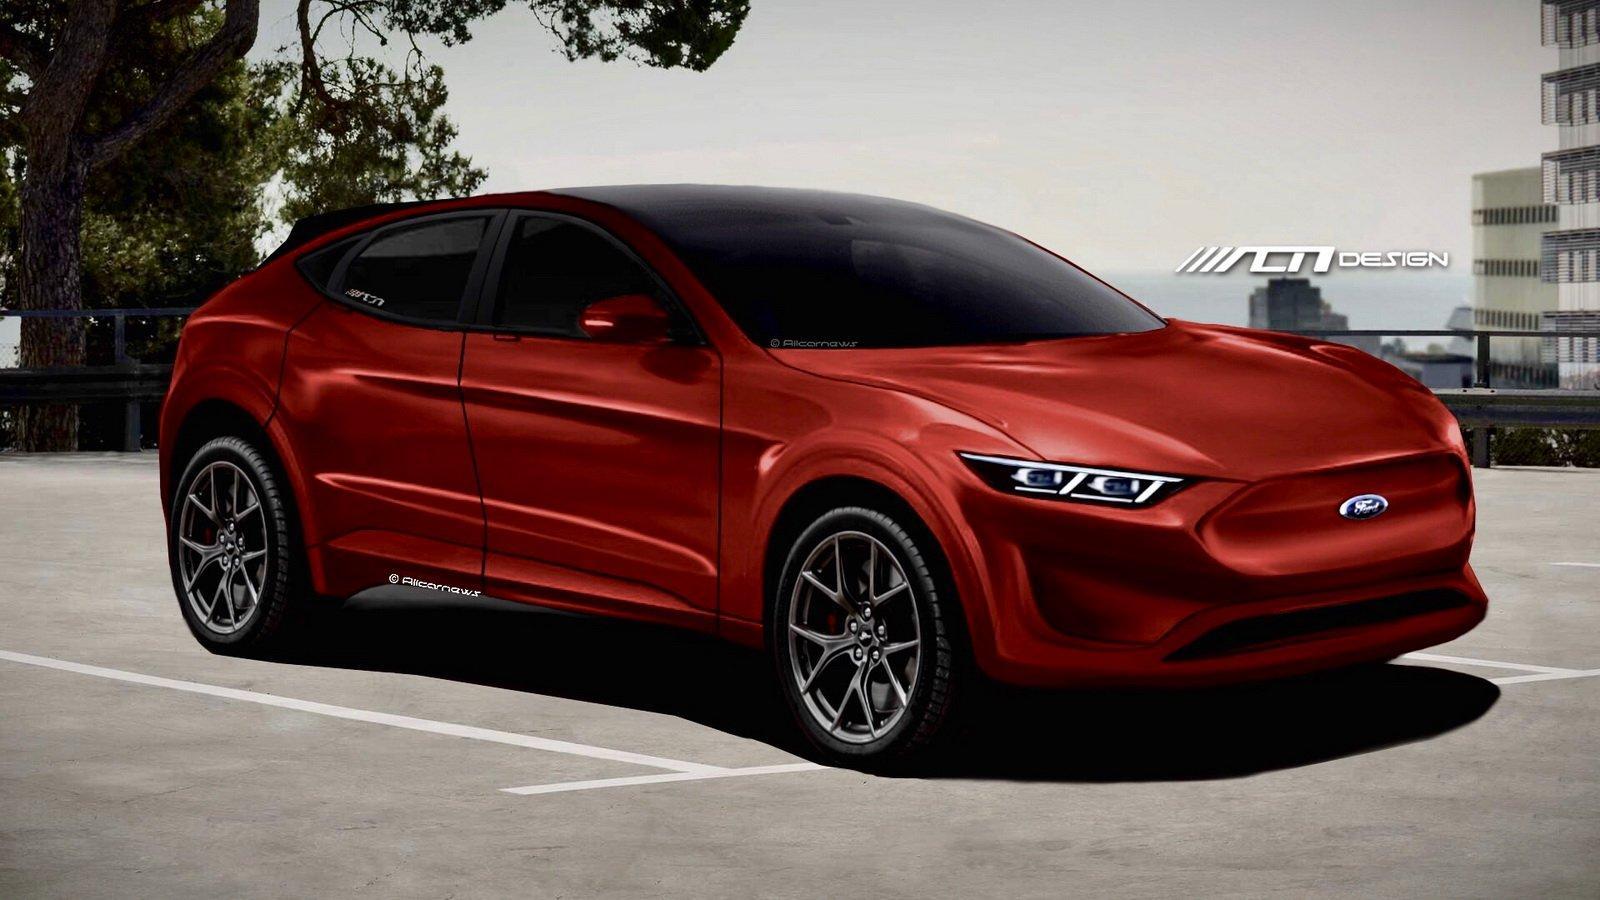 nuova ford mustang suv 2020 punta sull'elettrico